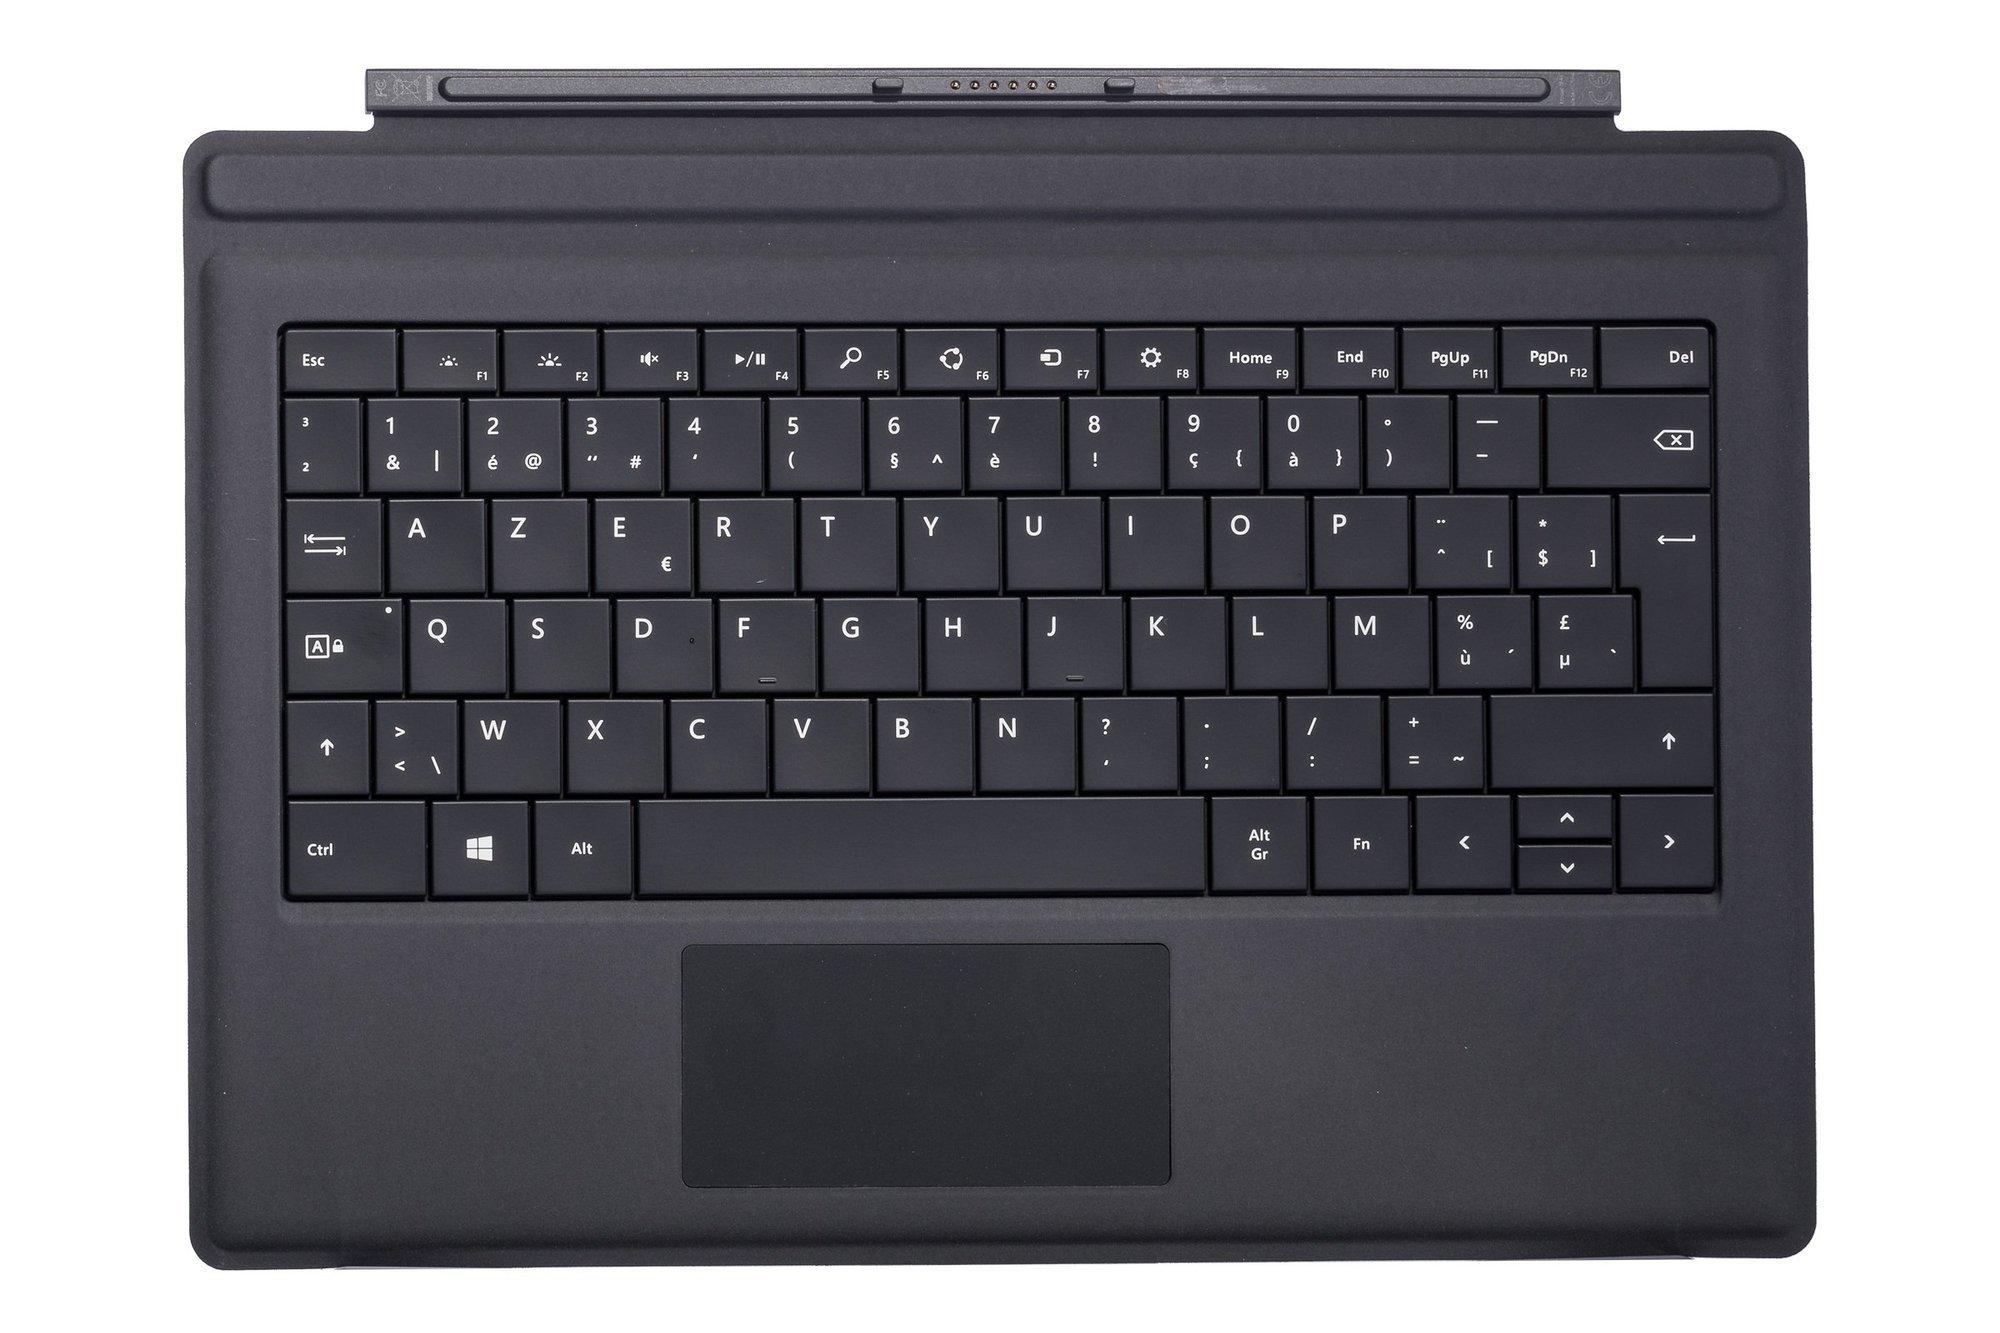 Keyboard Microsoft Surface Type Cover Pro 3 Black AZERTY (Belgian) Grade B